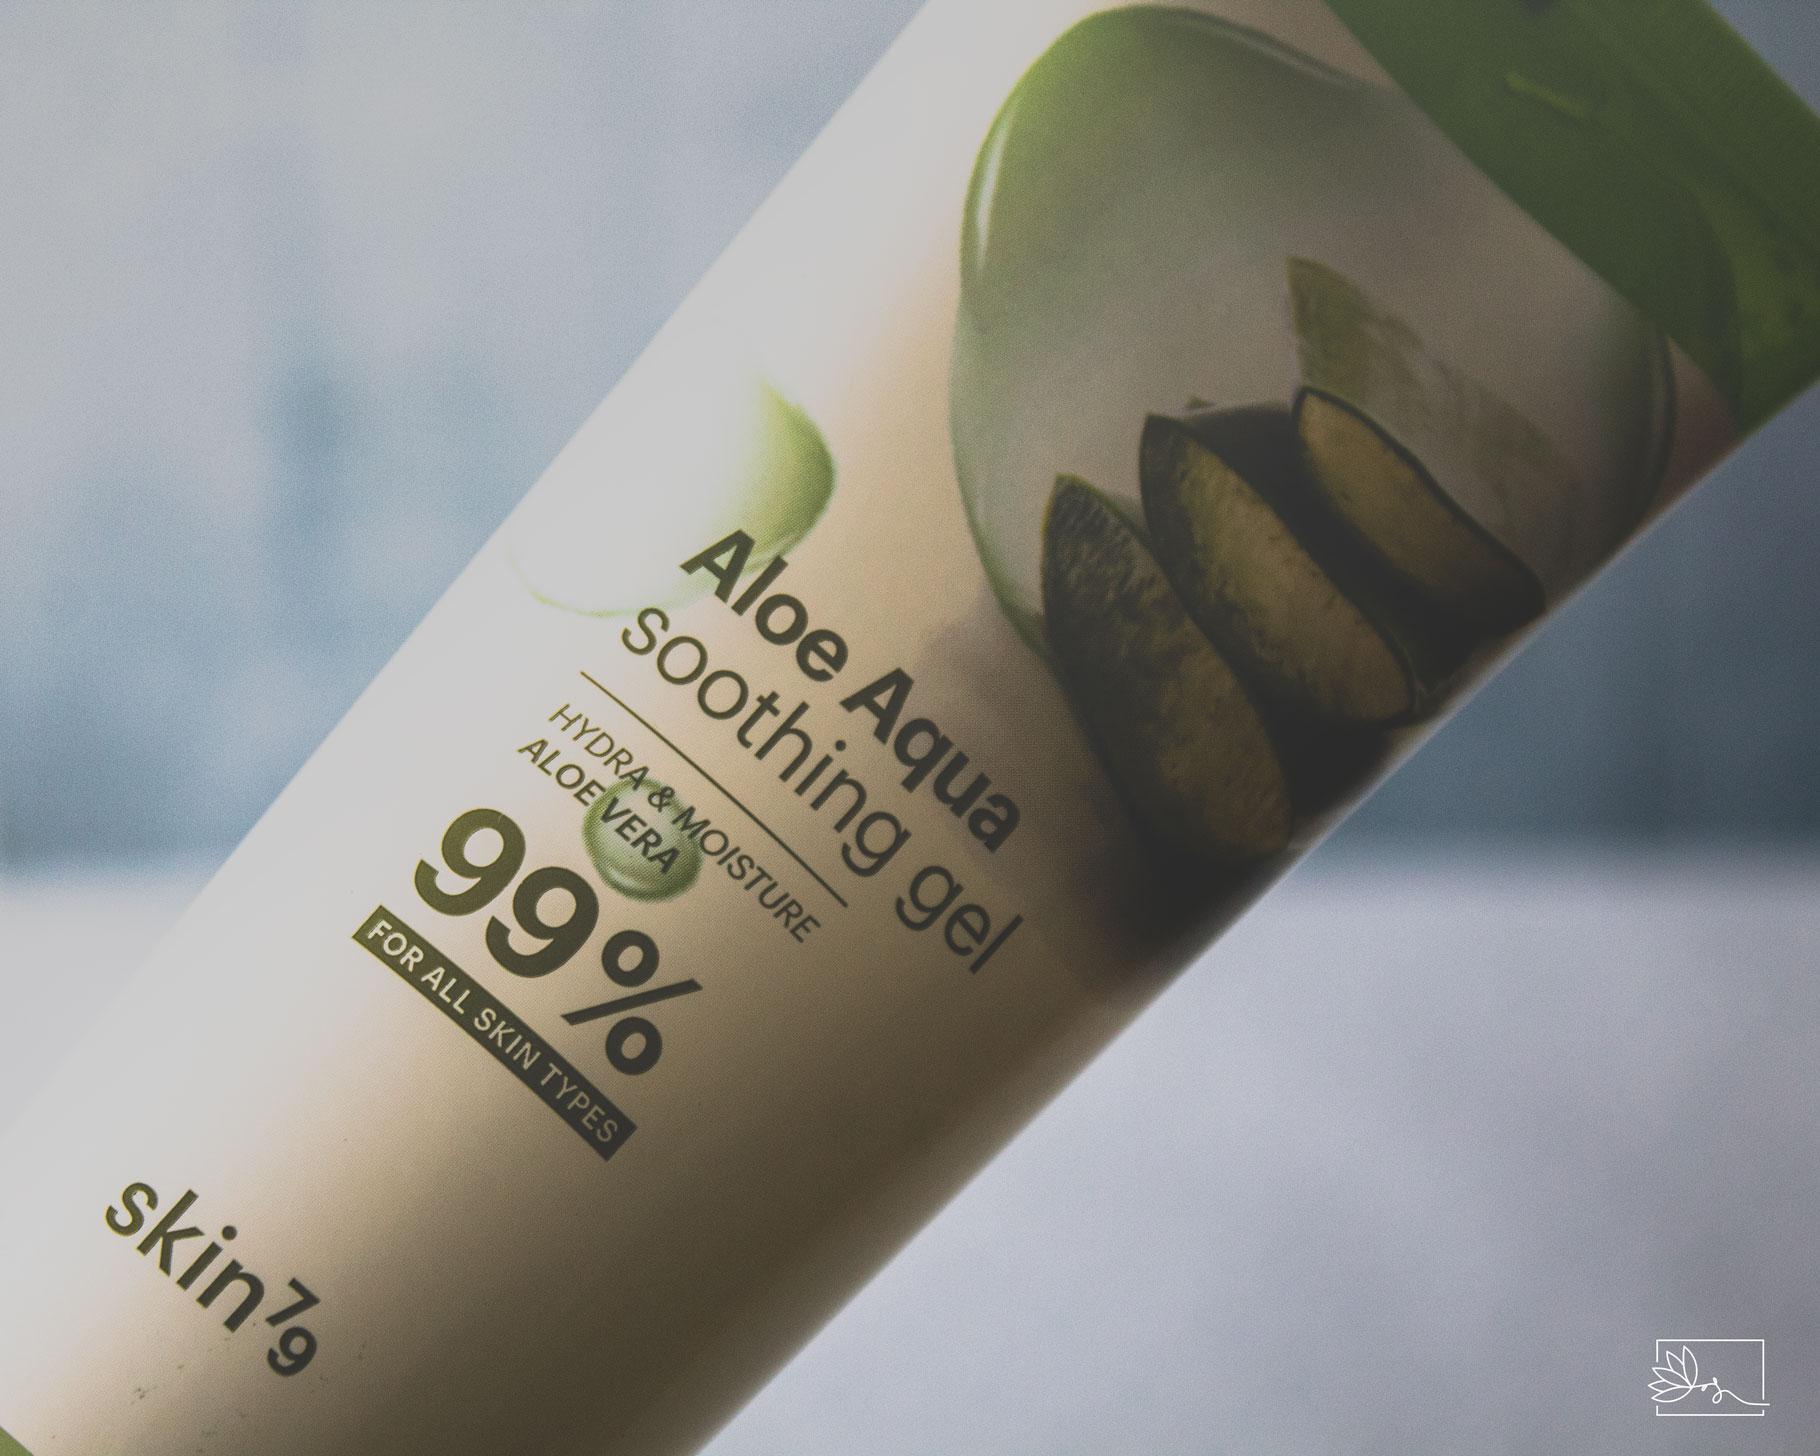 Żel aloesowy Aloe Aqua Skin79